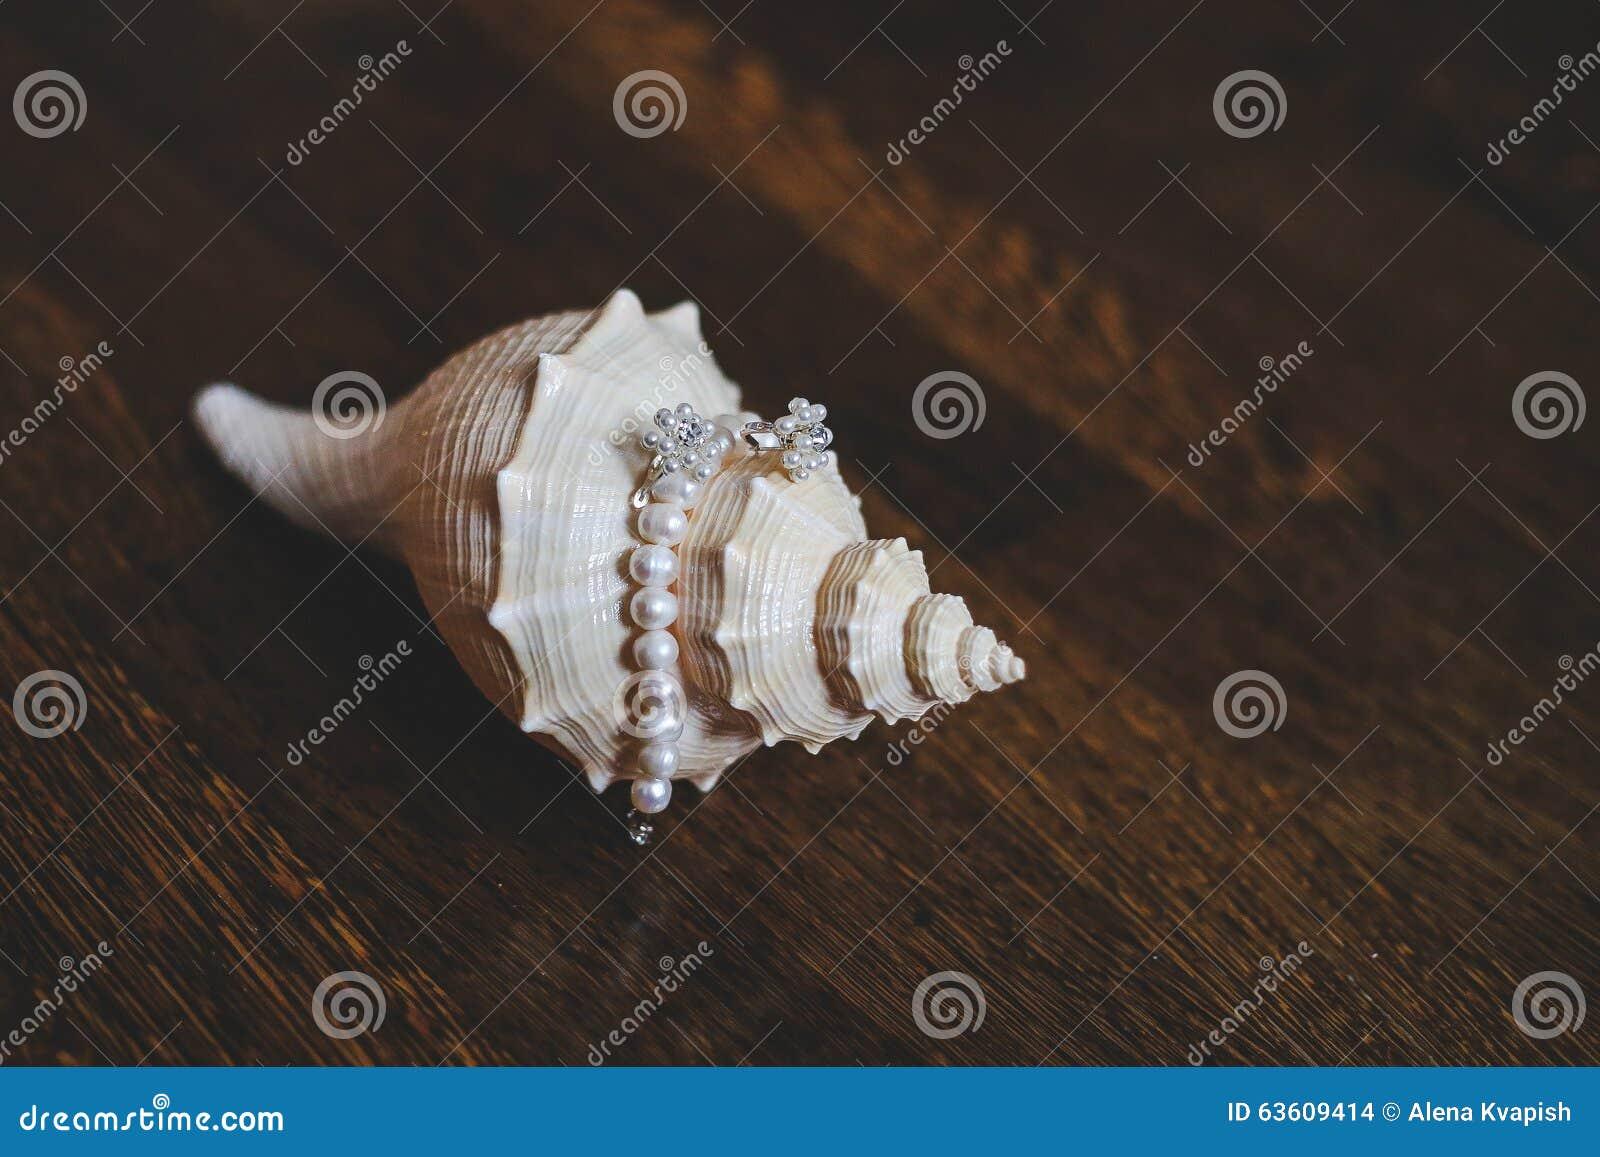 Серьги и браслет жемчугов лежат на раковине